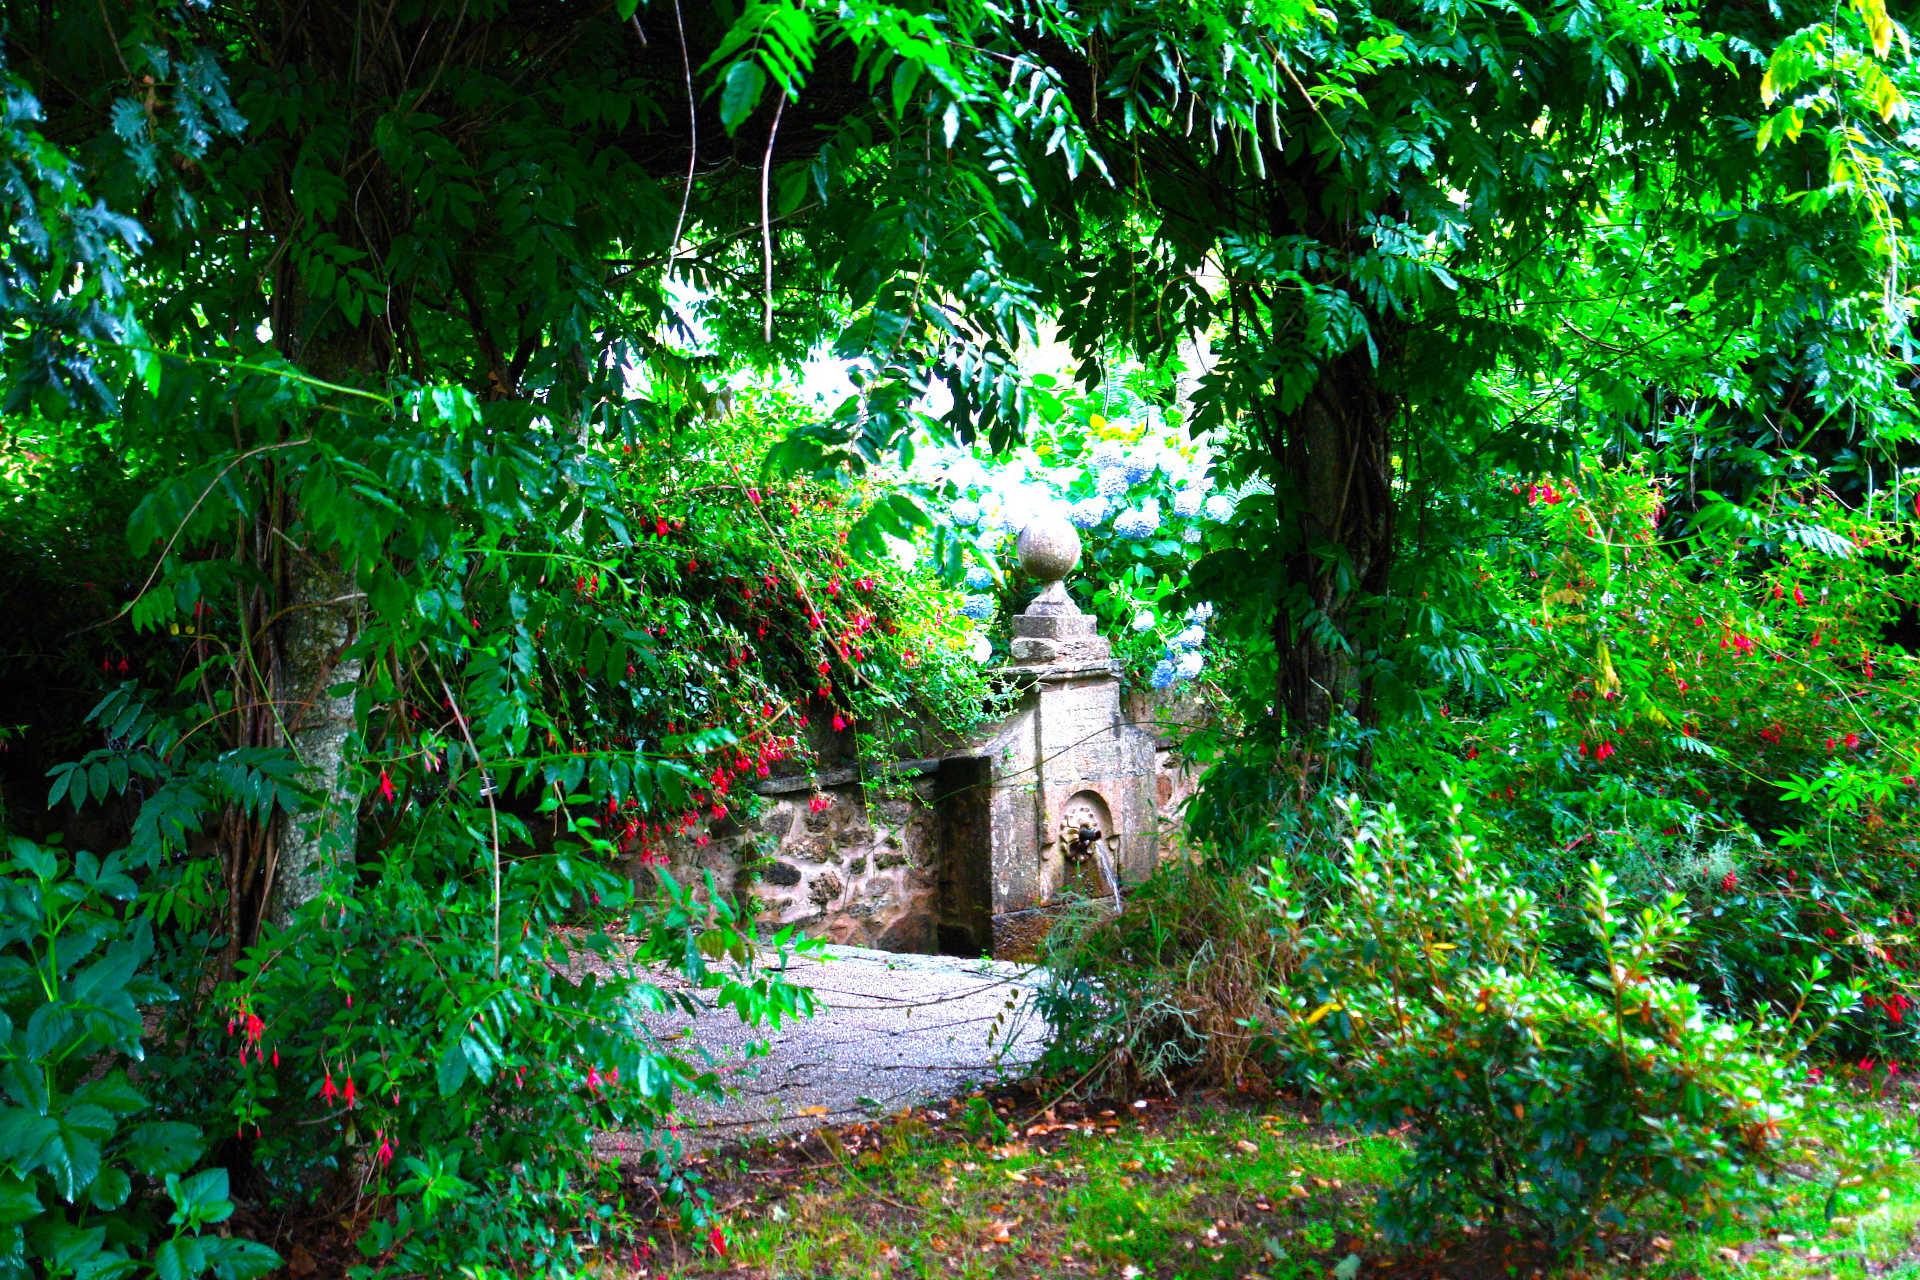 Fuente entre parras casa rural as seis chemineas casa for Casa rural mansion terraplen seis